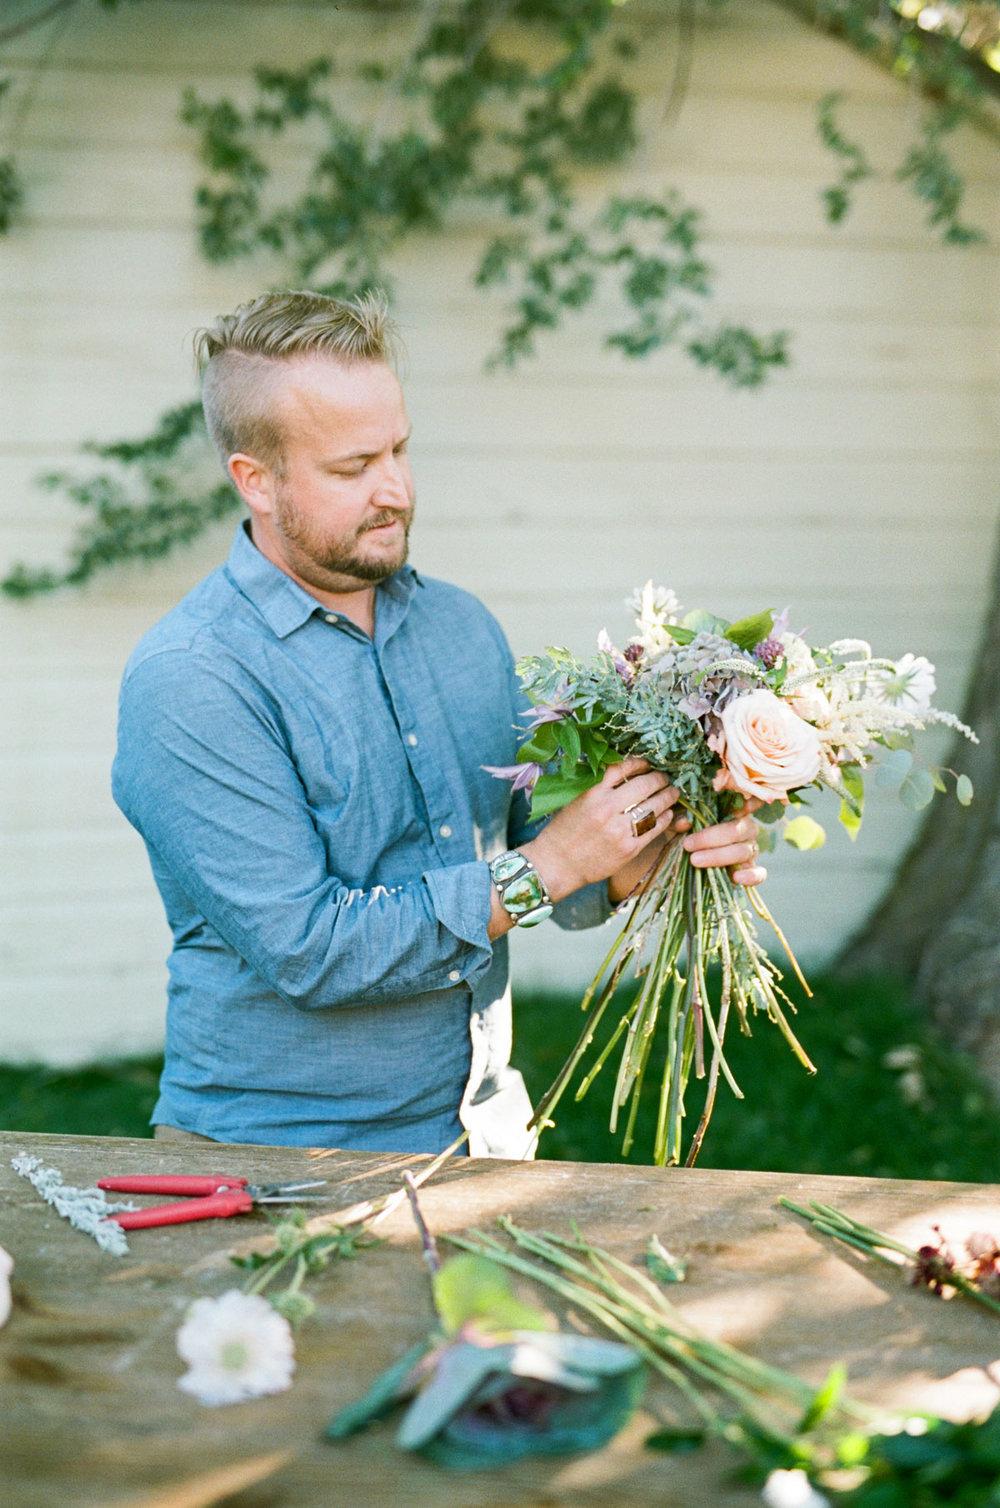 Wedding Florist Joshua Knight creates gorgeous custom wedding bouquets in Salt Lake City, Utah